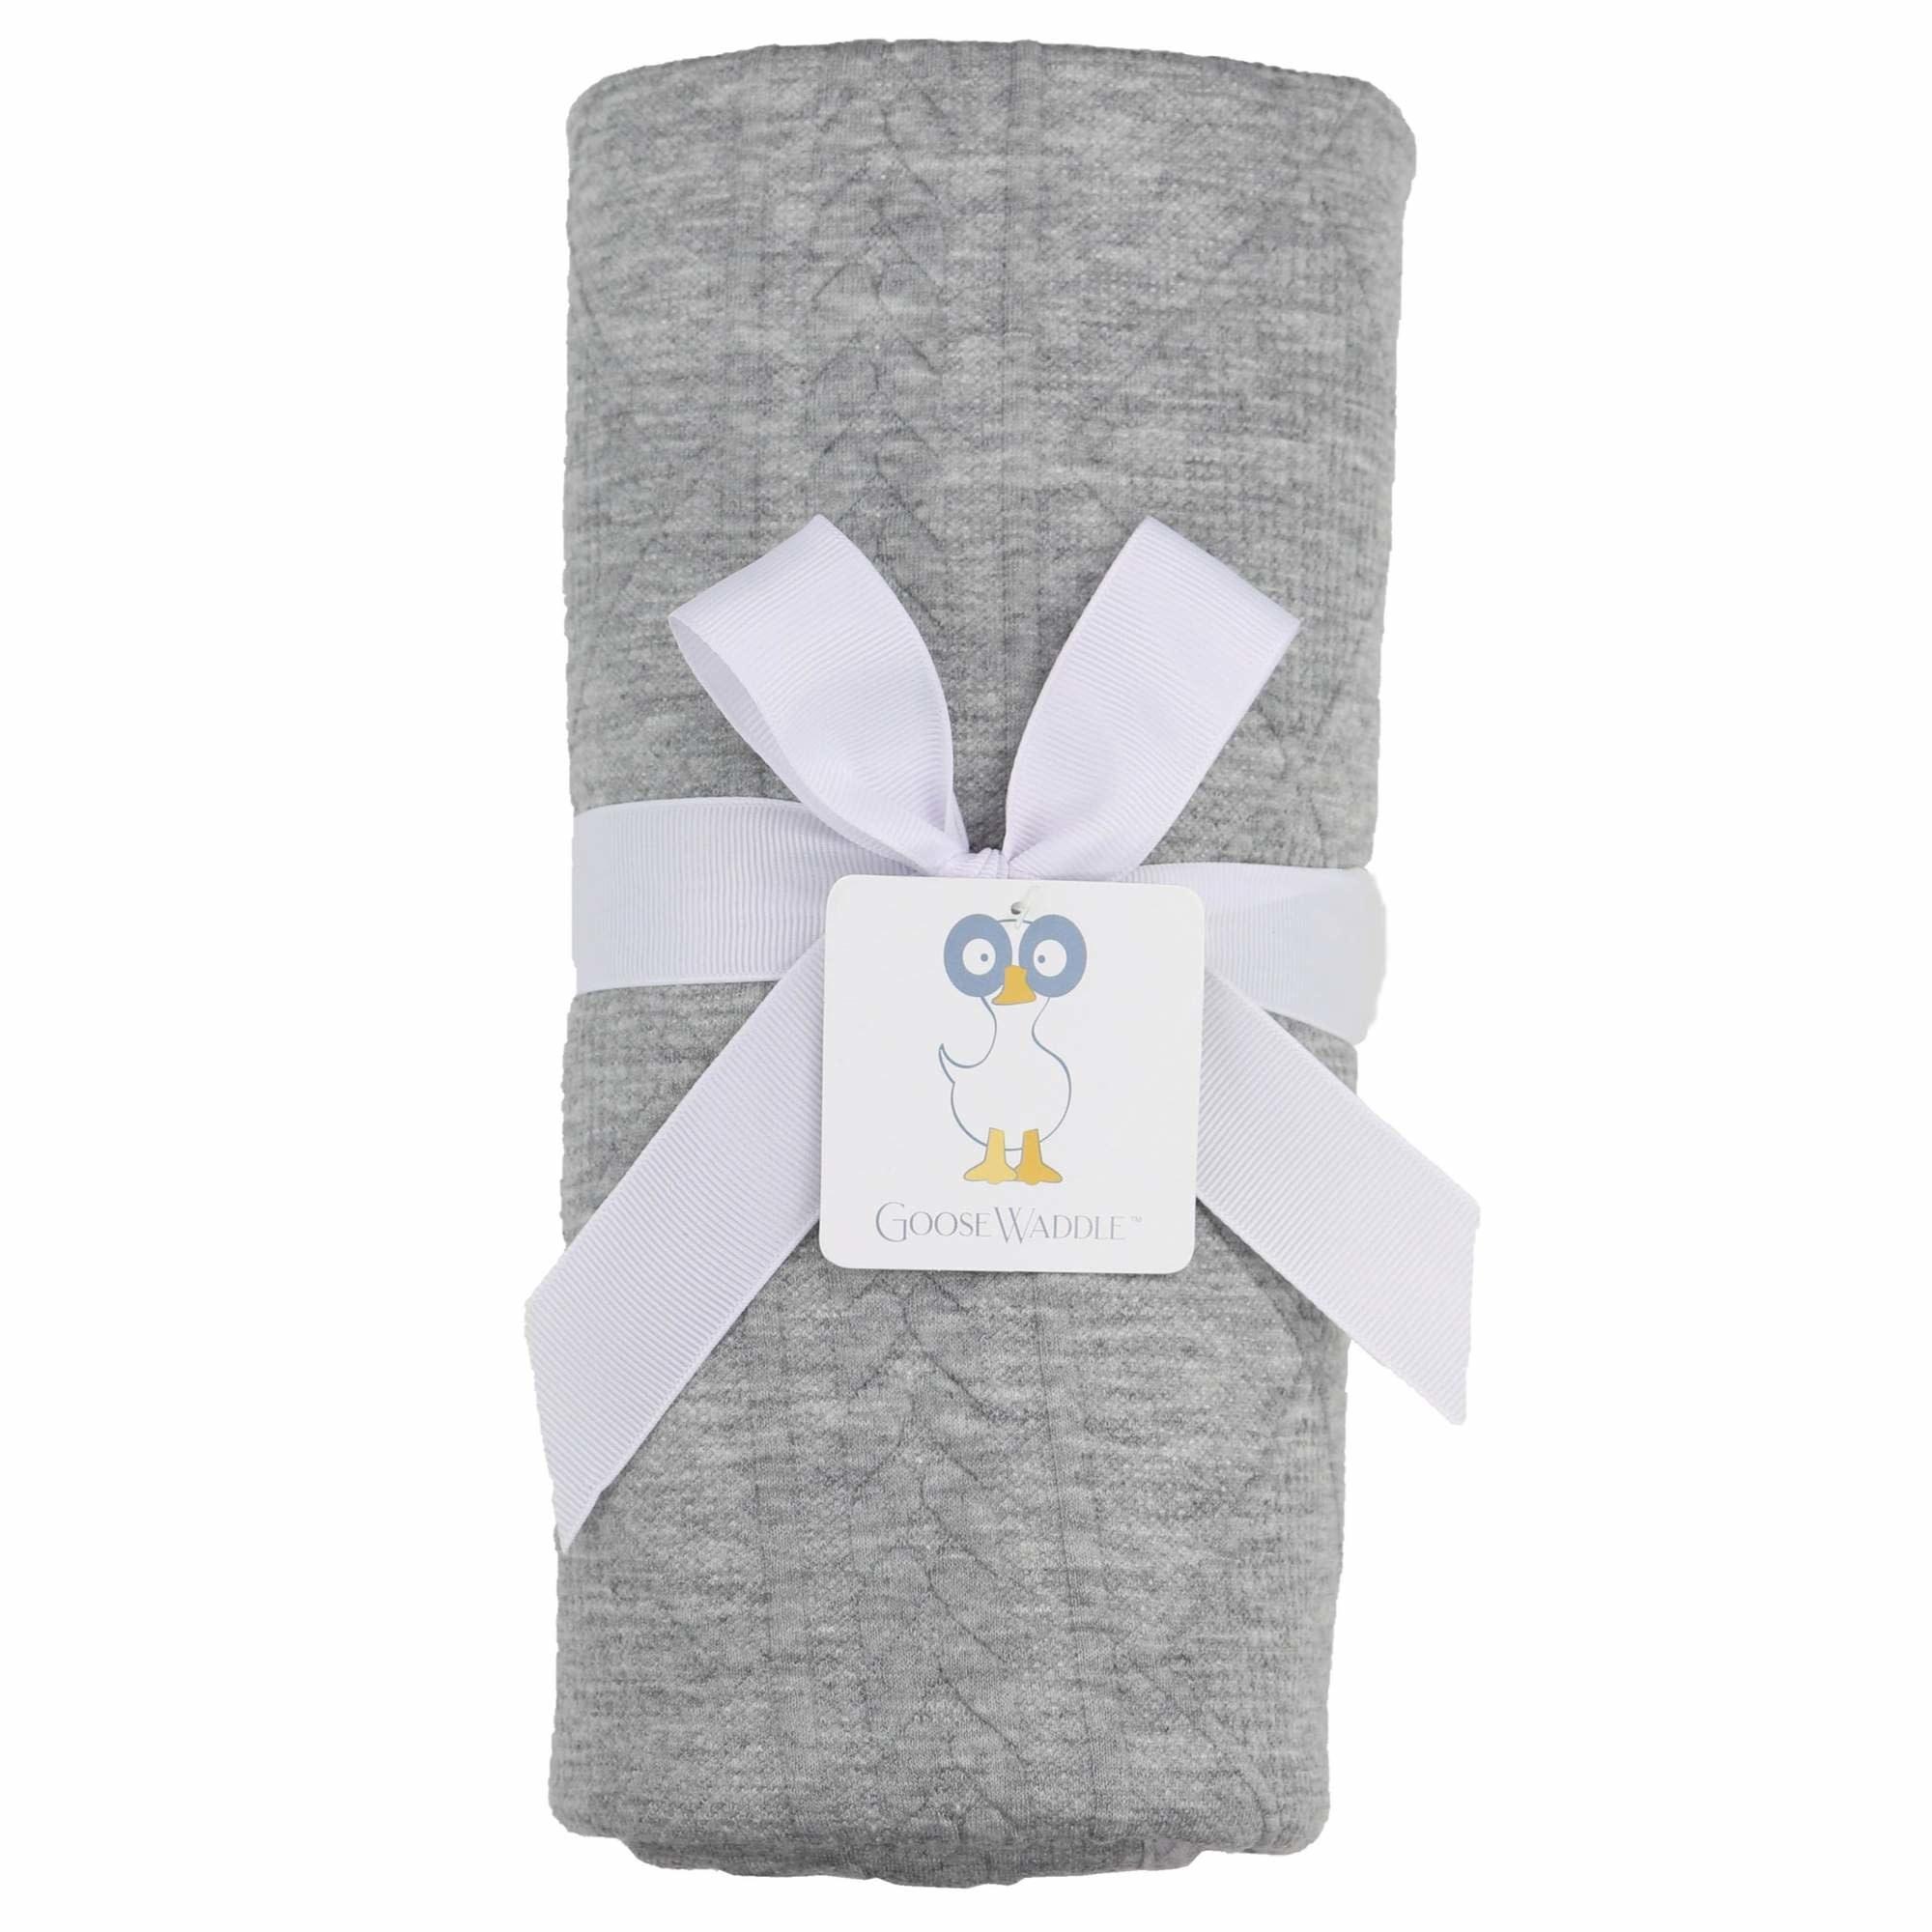 GooseWaddle Knit Blanket